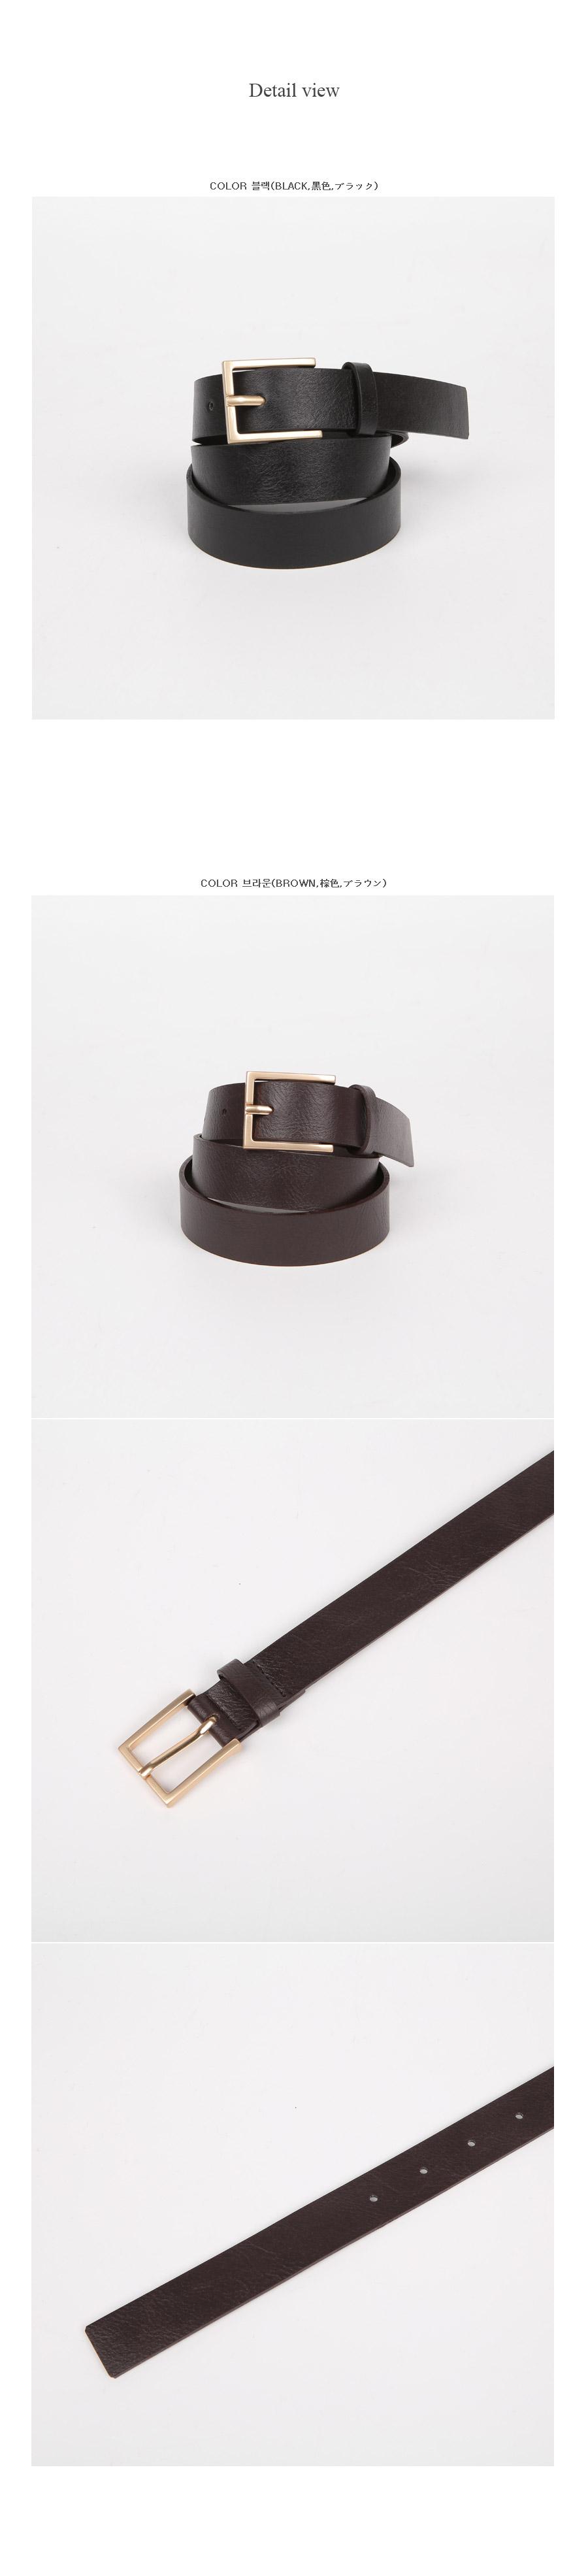 Paymo belt